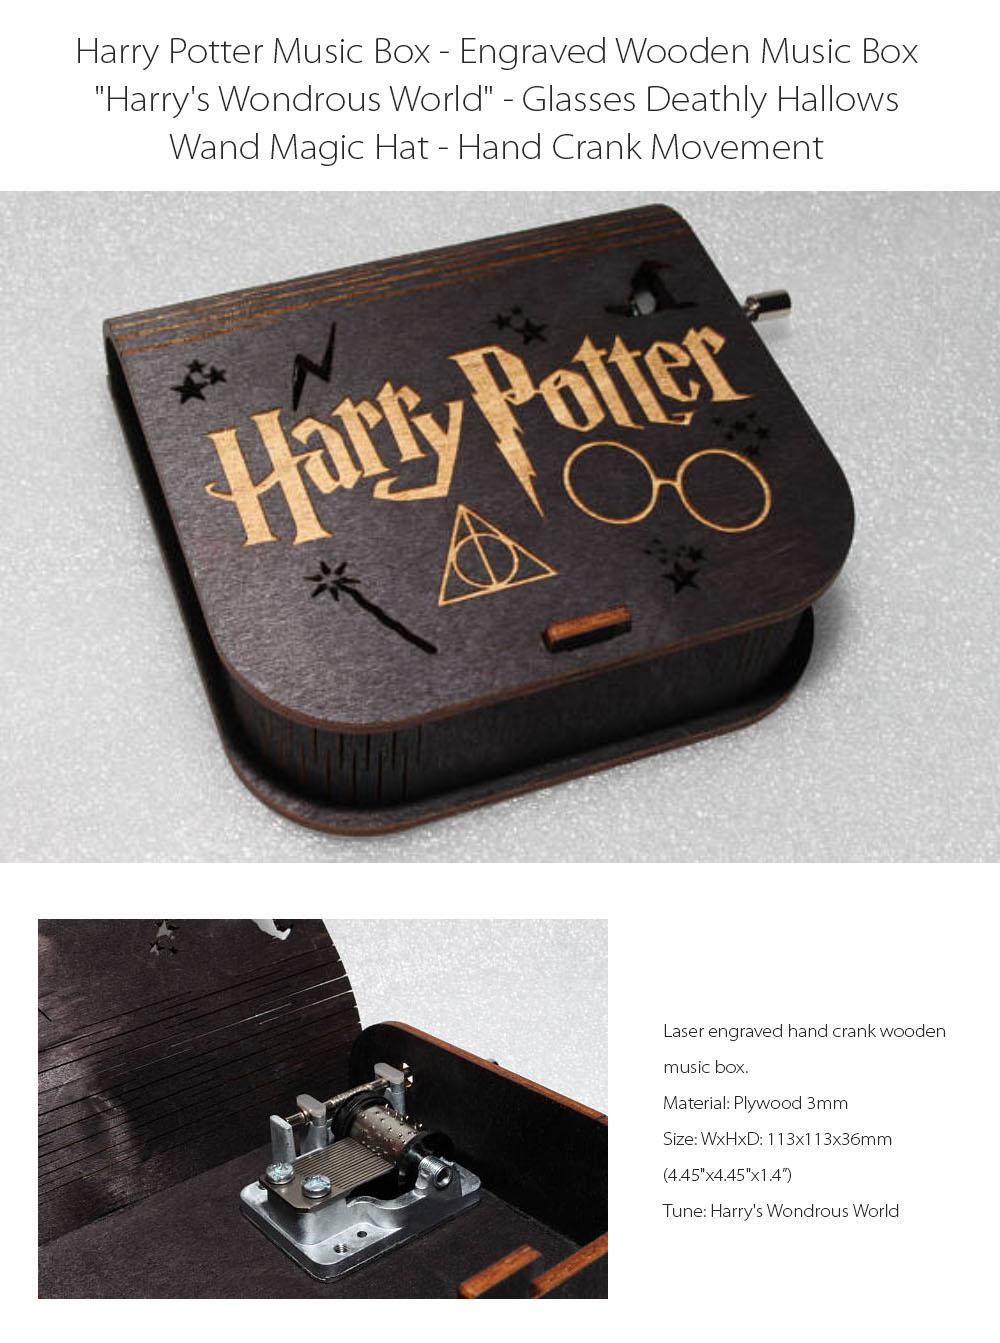 Harry Potter Music Box Harry's Wondrous World